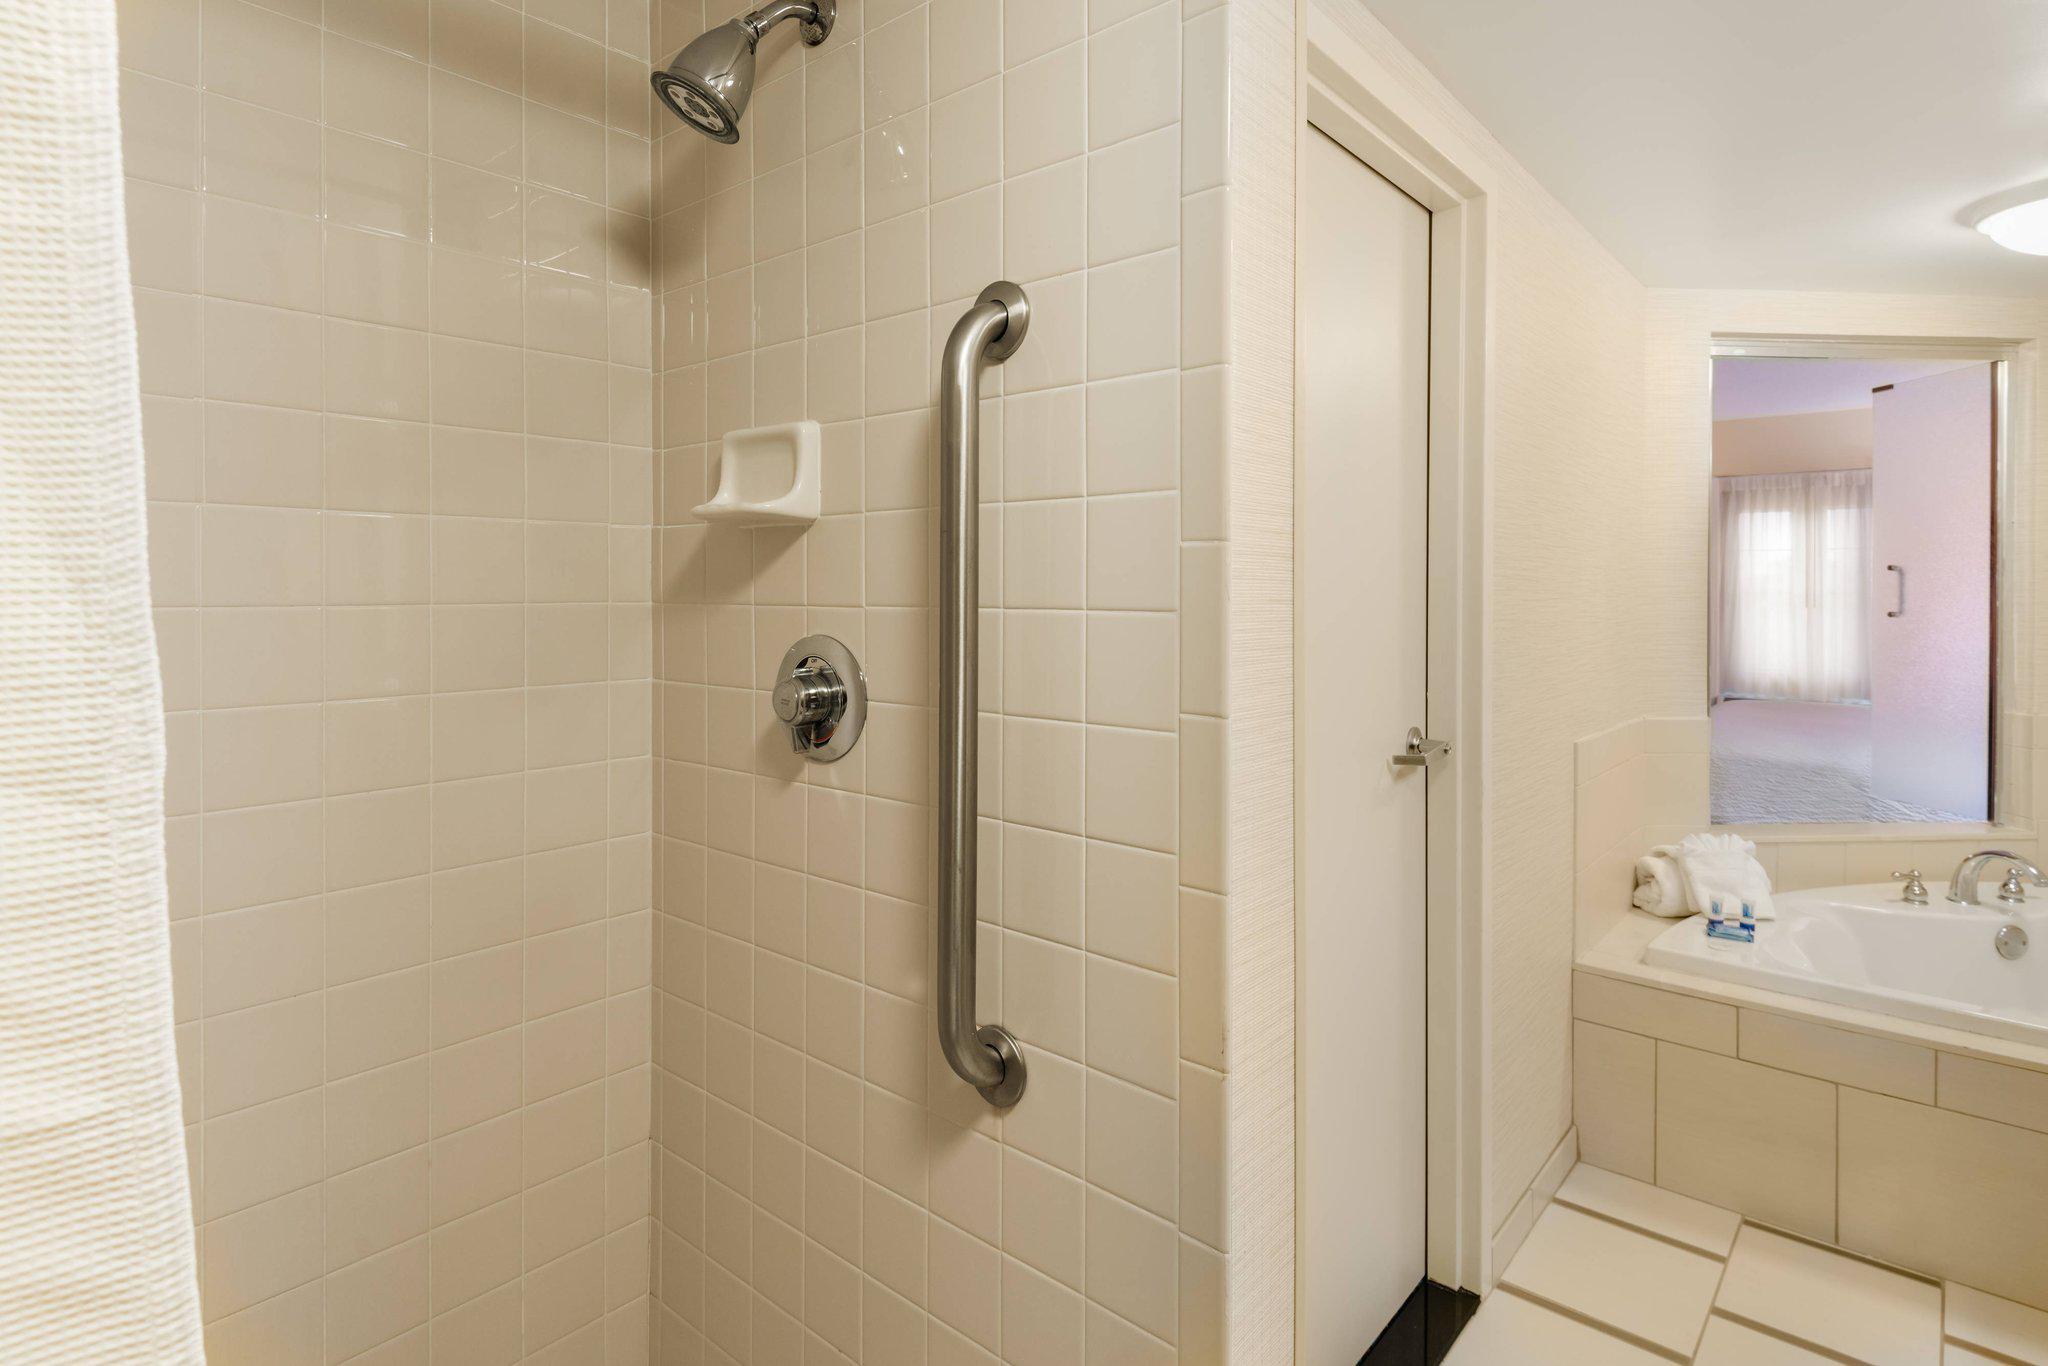 Fairfield Inn & Suites by Marriott Clearwater in Clearwater, FL, photo #20